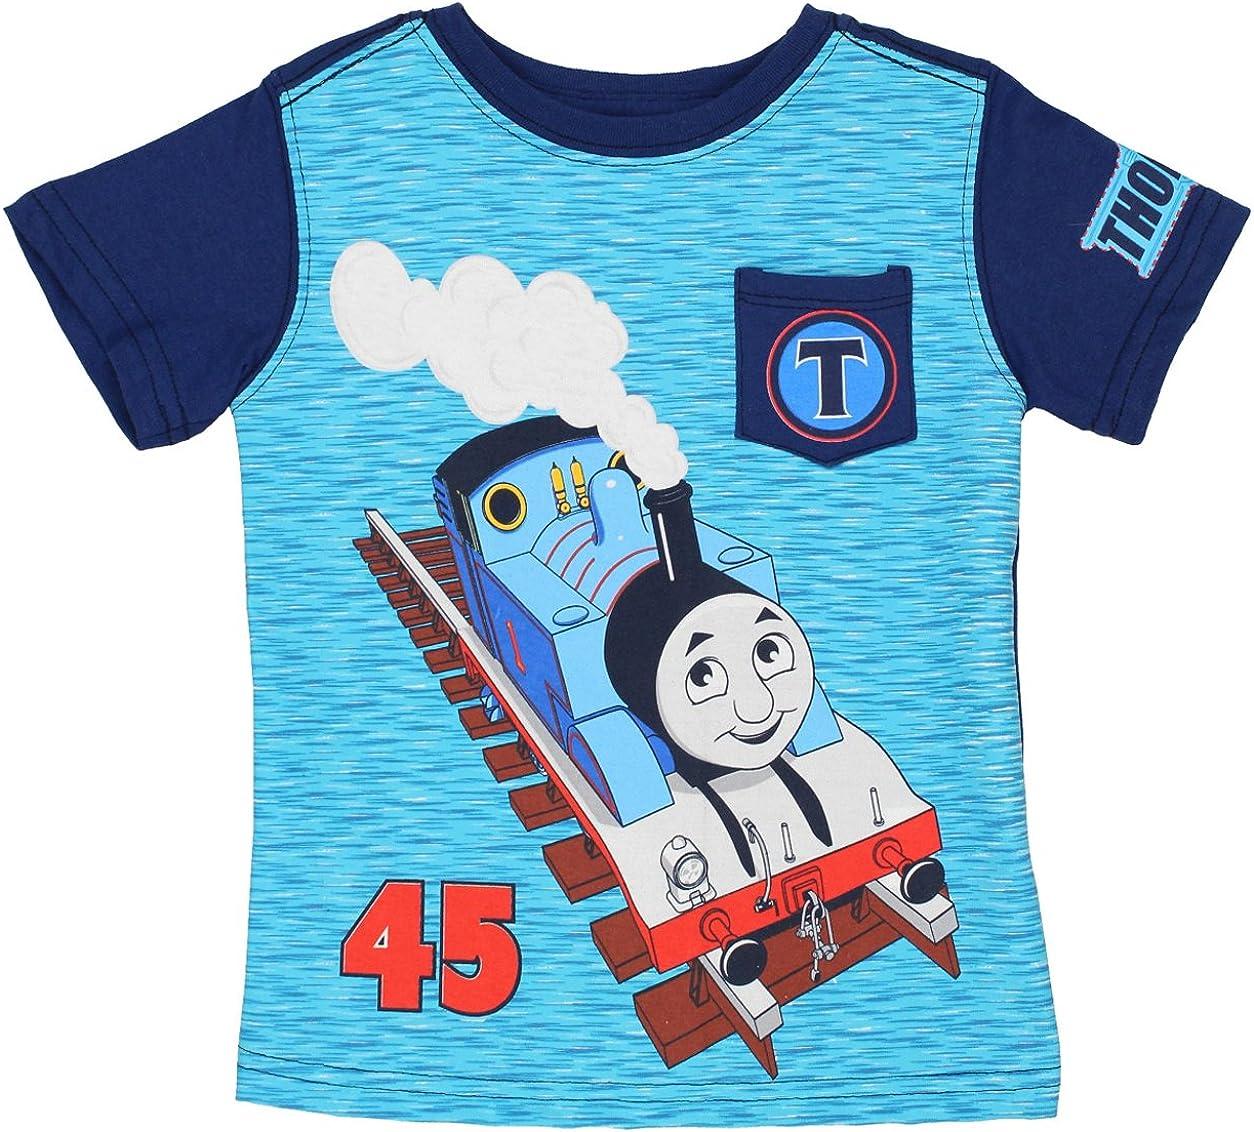 Thomas & Friends Short Sleeve Tee (4T, Navy/Blue Thomas)